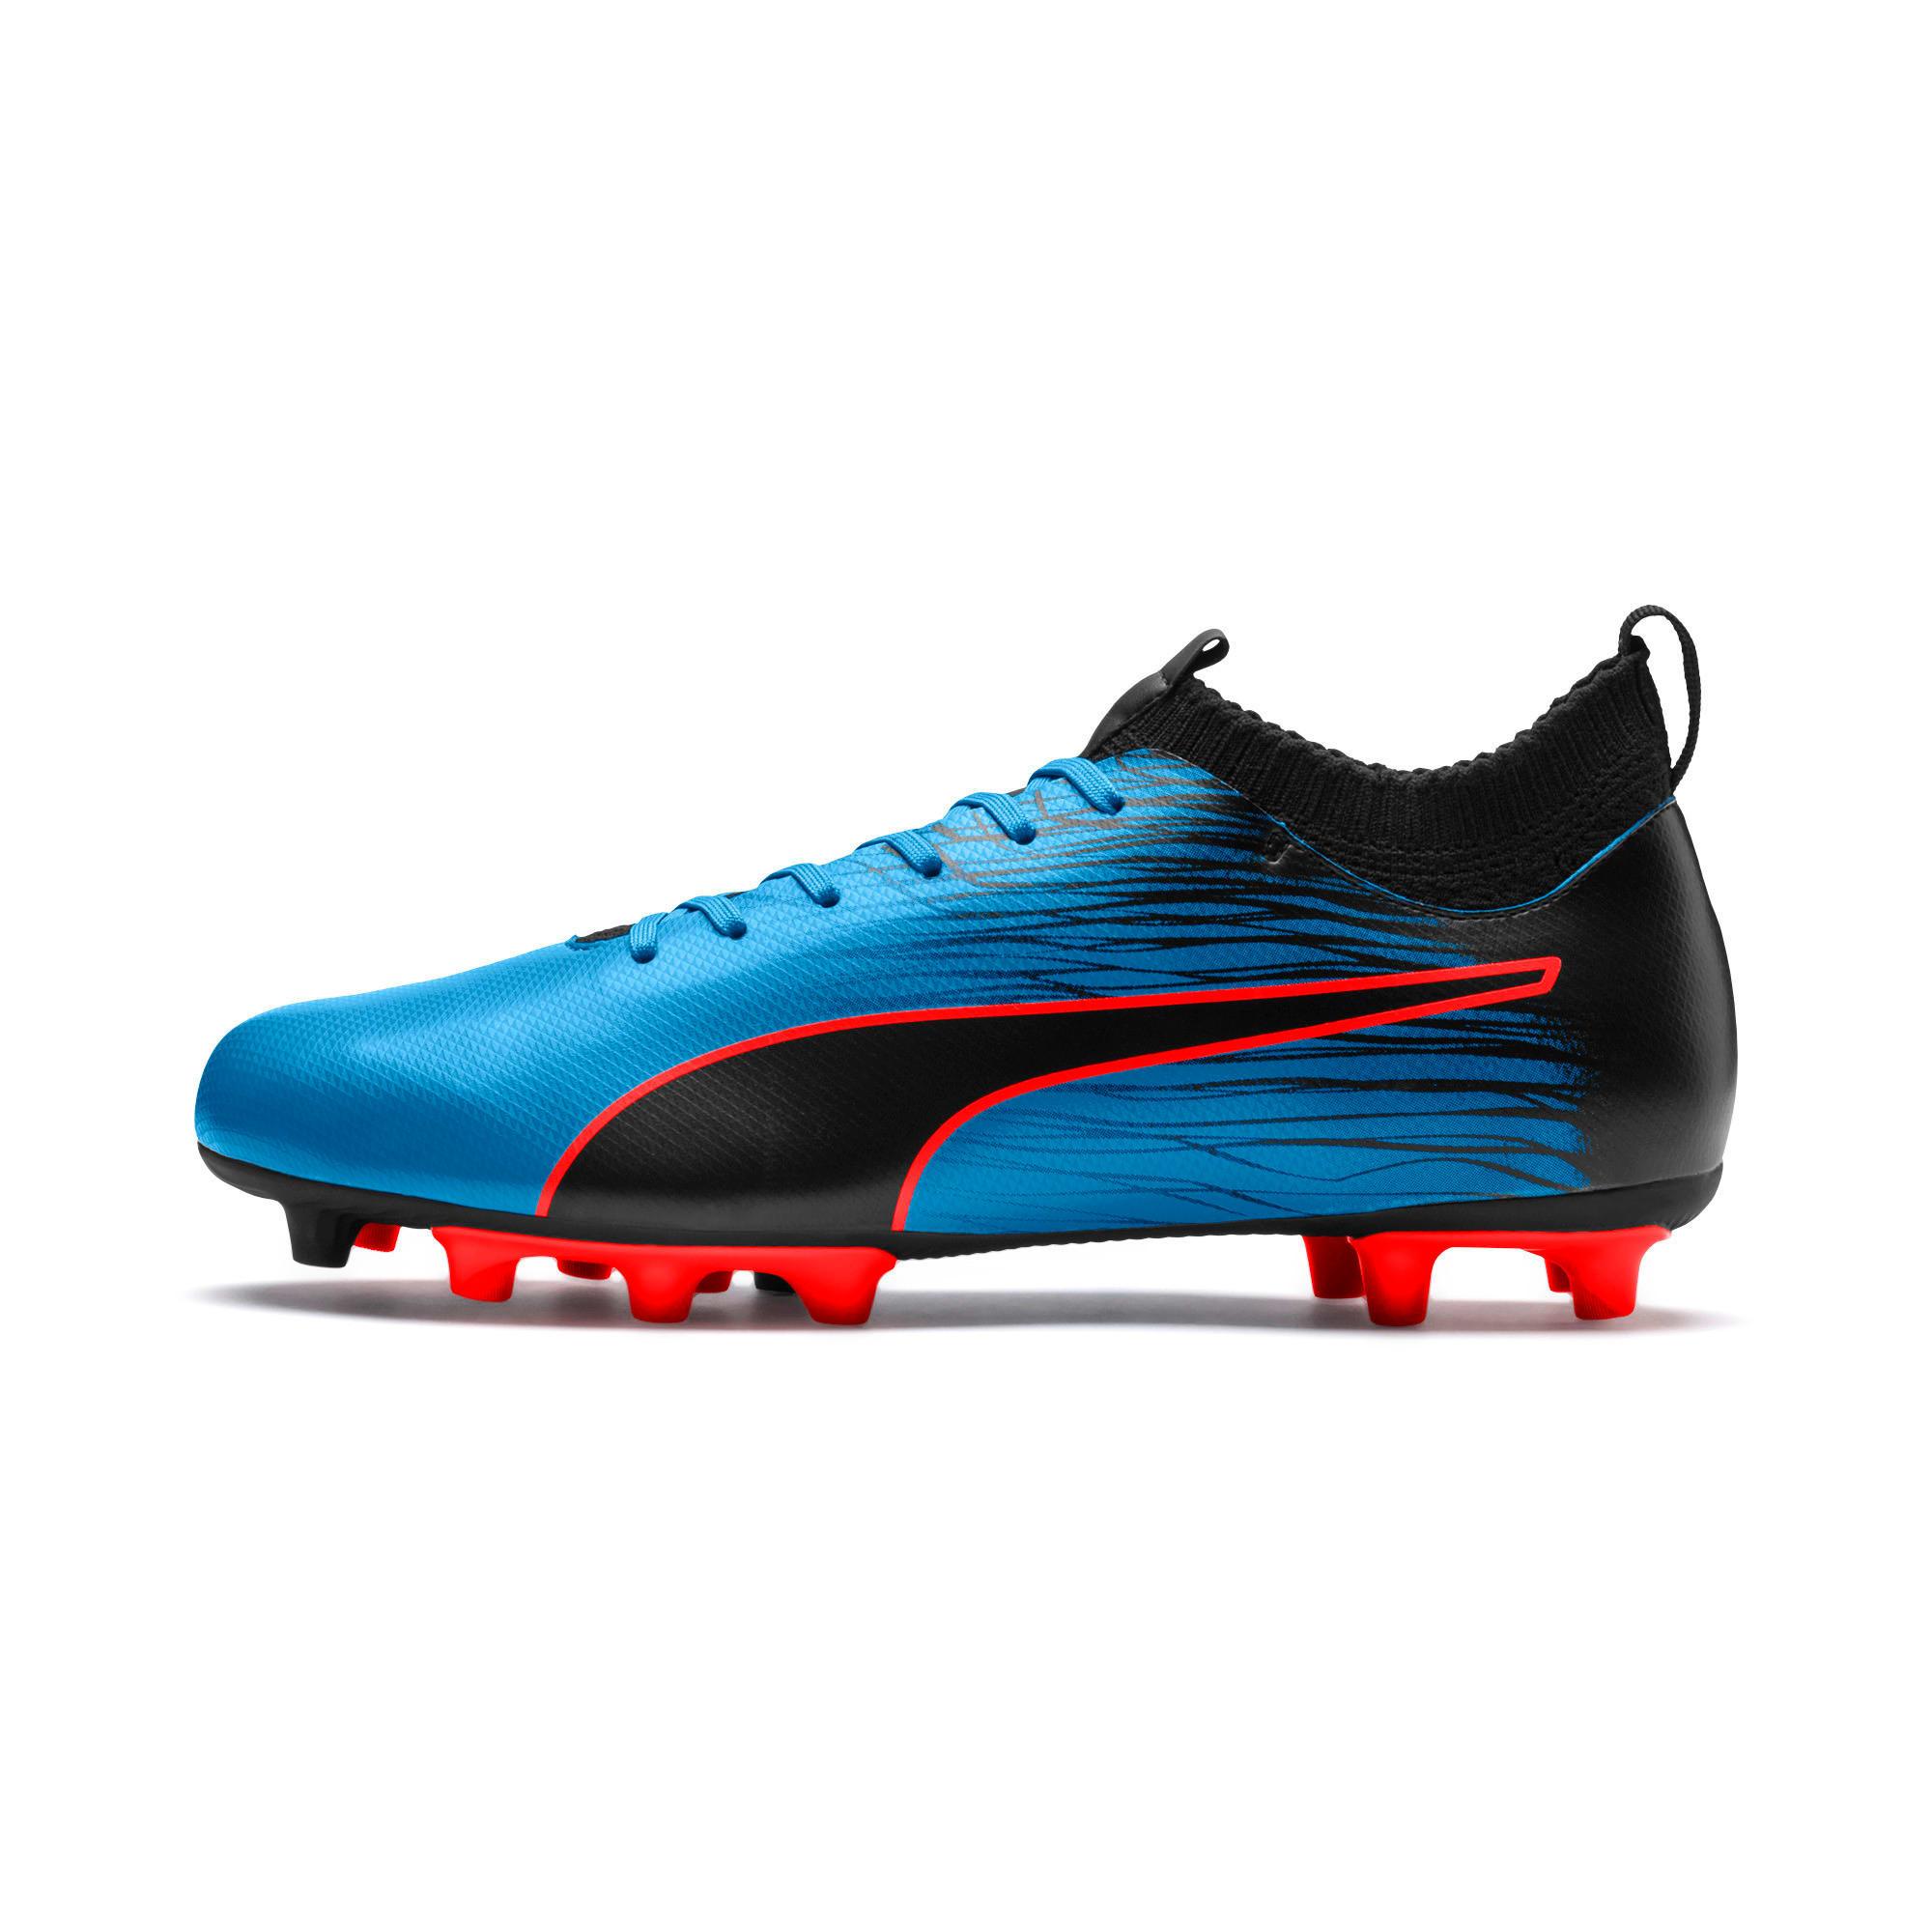 Thumbnail 1 of evoKNIT FTB II FG Men's Football Boots, Bleu Azur-Red Blast-Black, medium-IND